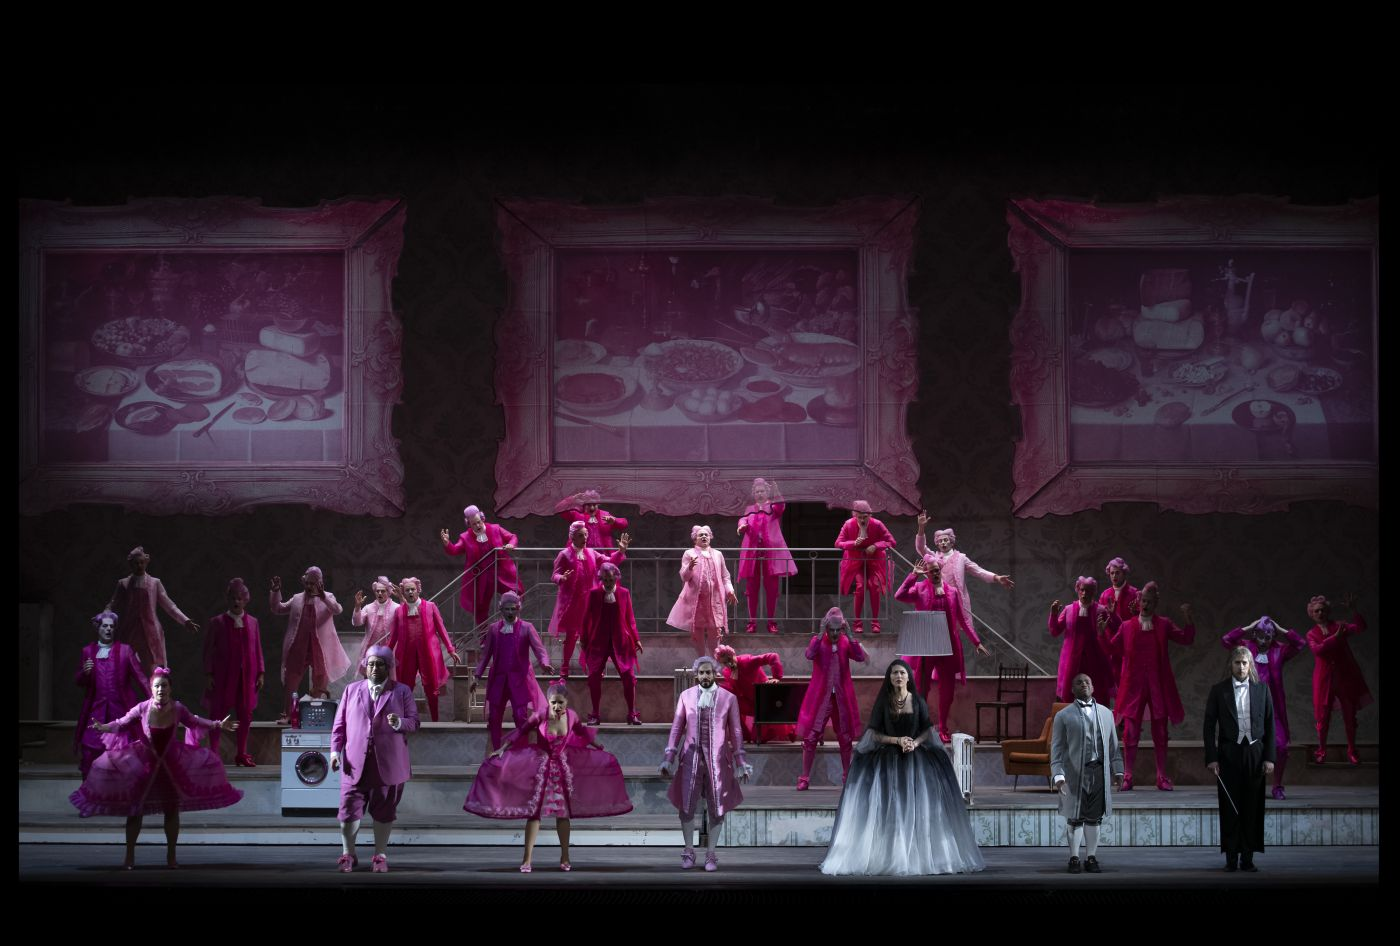 La Cenerentola - De Nationale Opera © BAUS_MB80726.jpeg (145.47 KB)